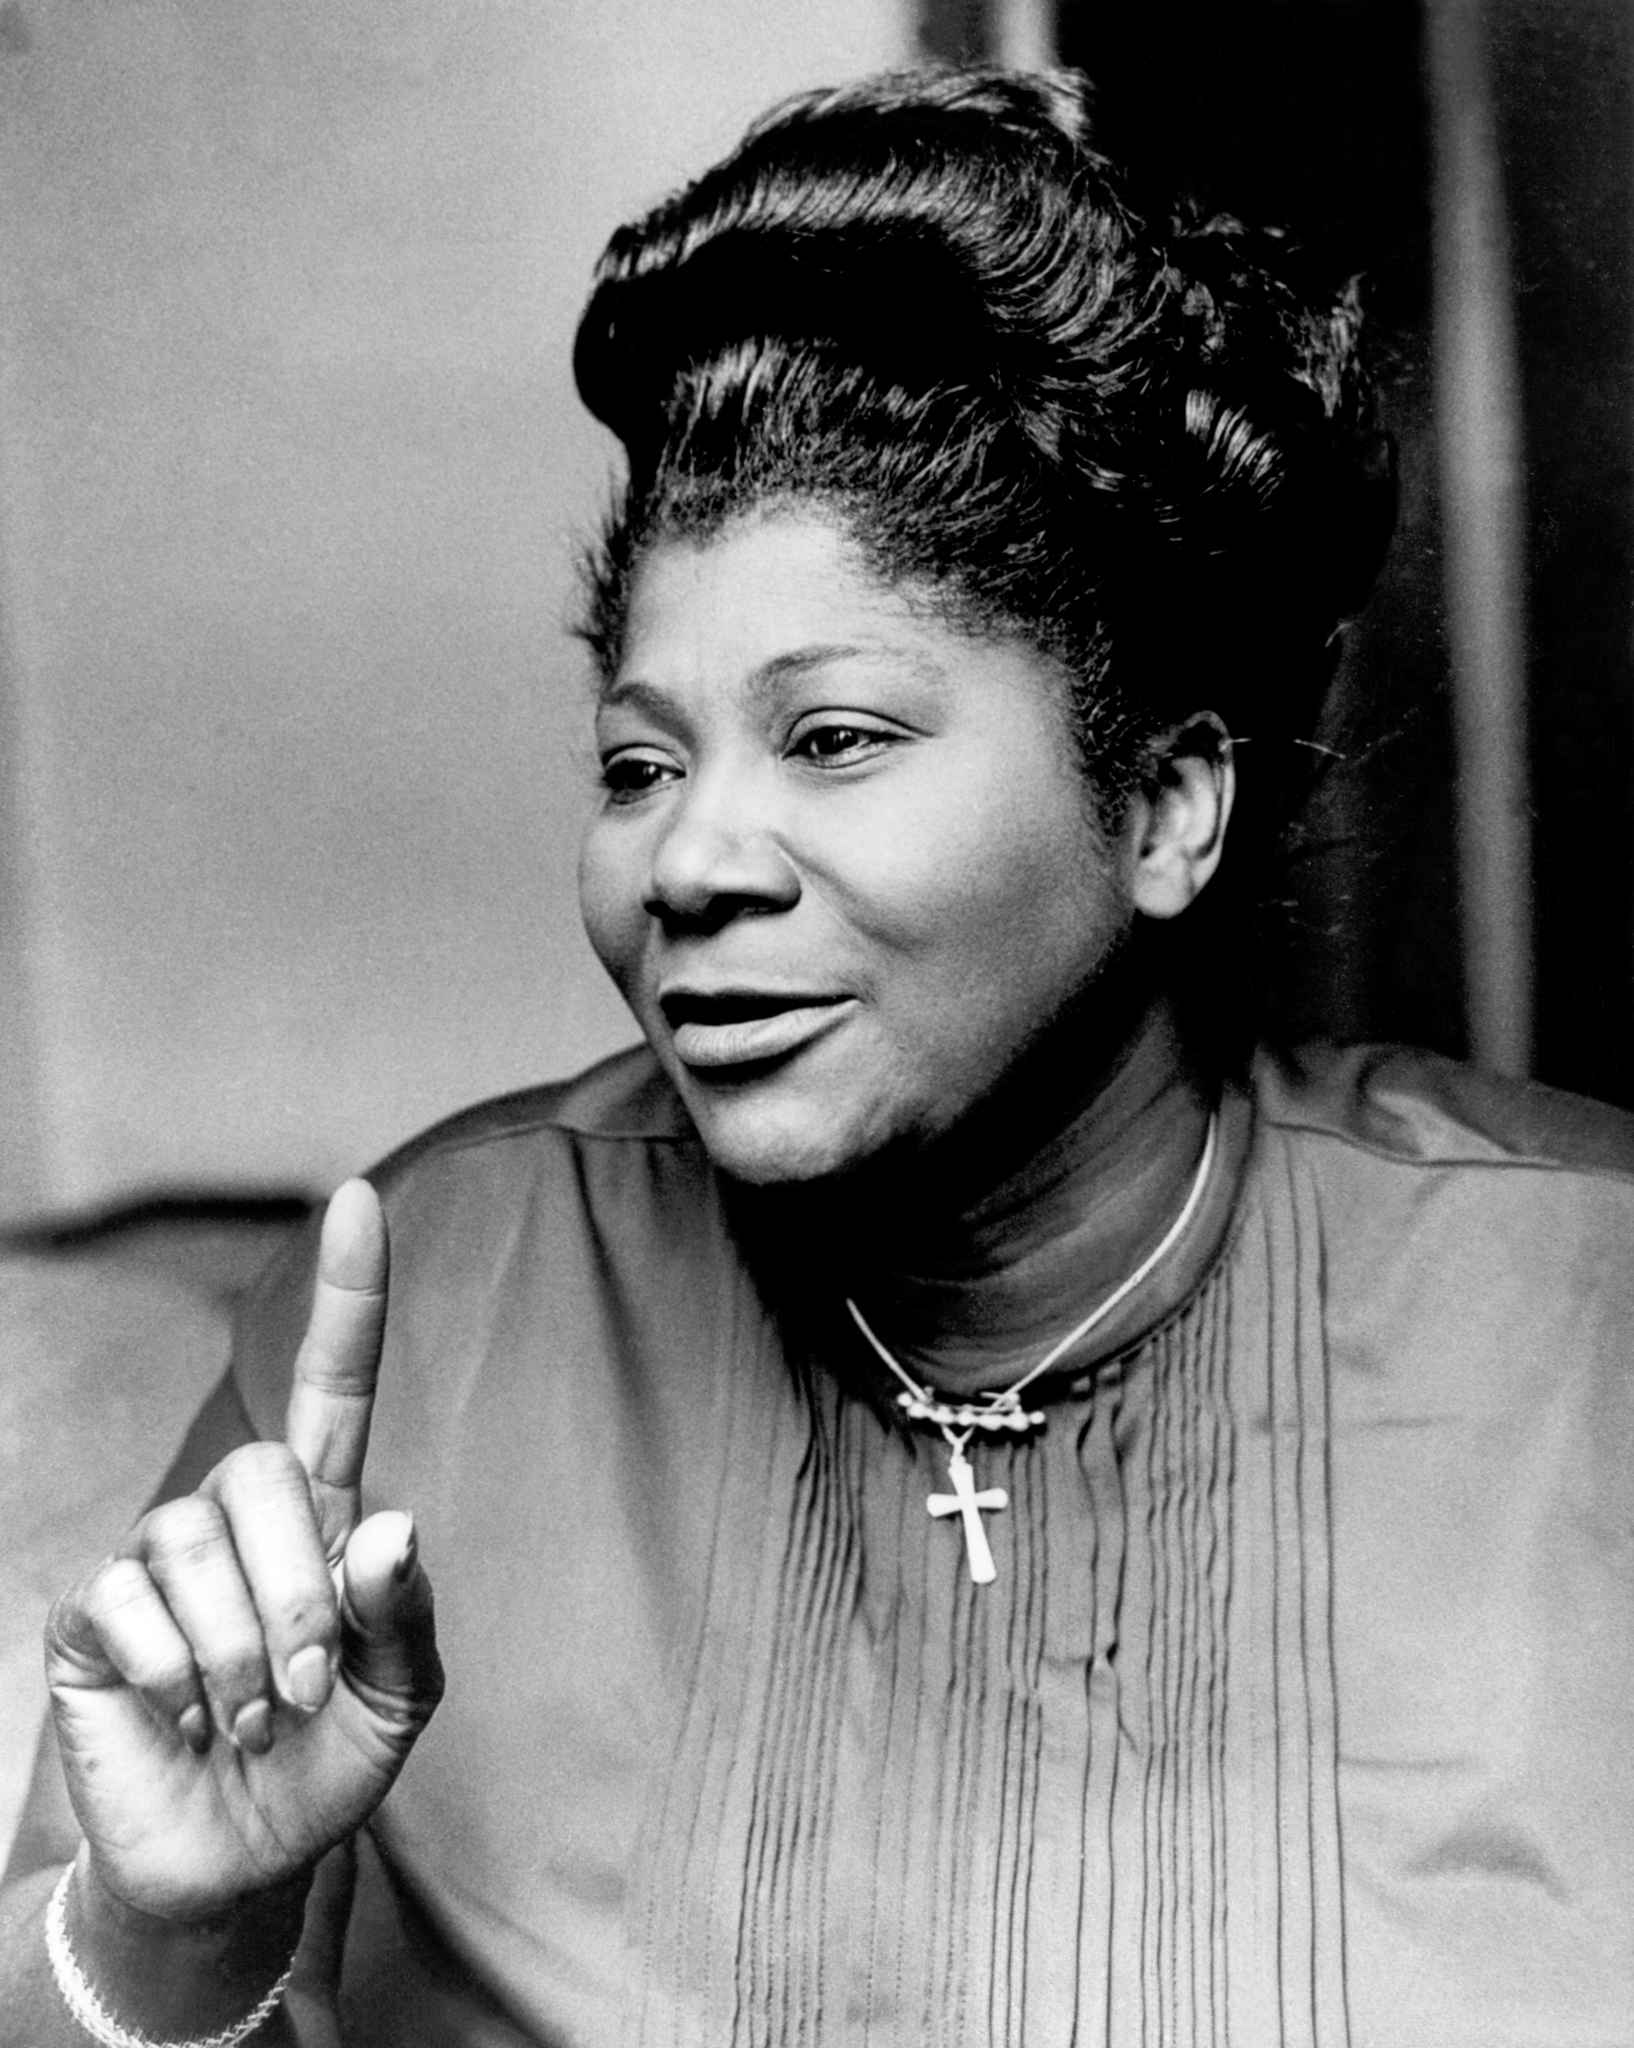 Mahalia Jackson's primary photo